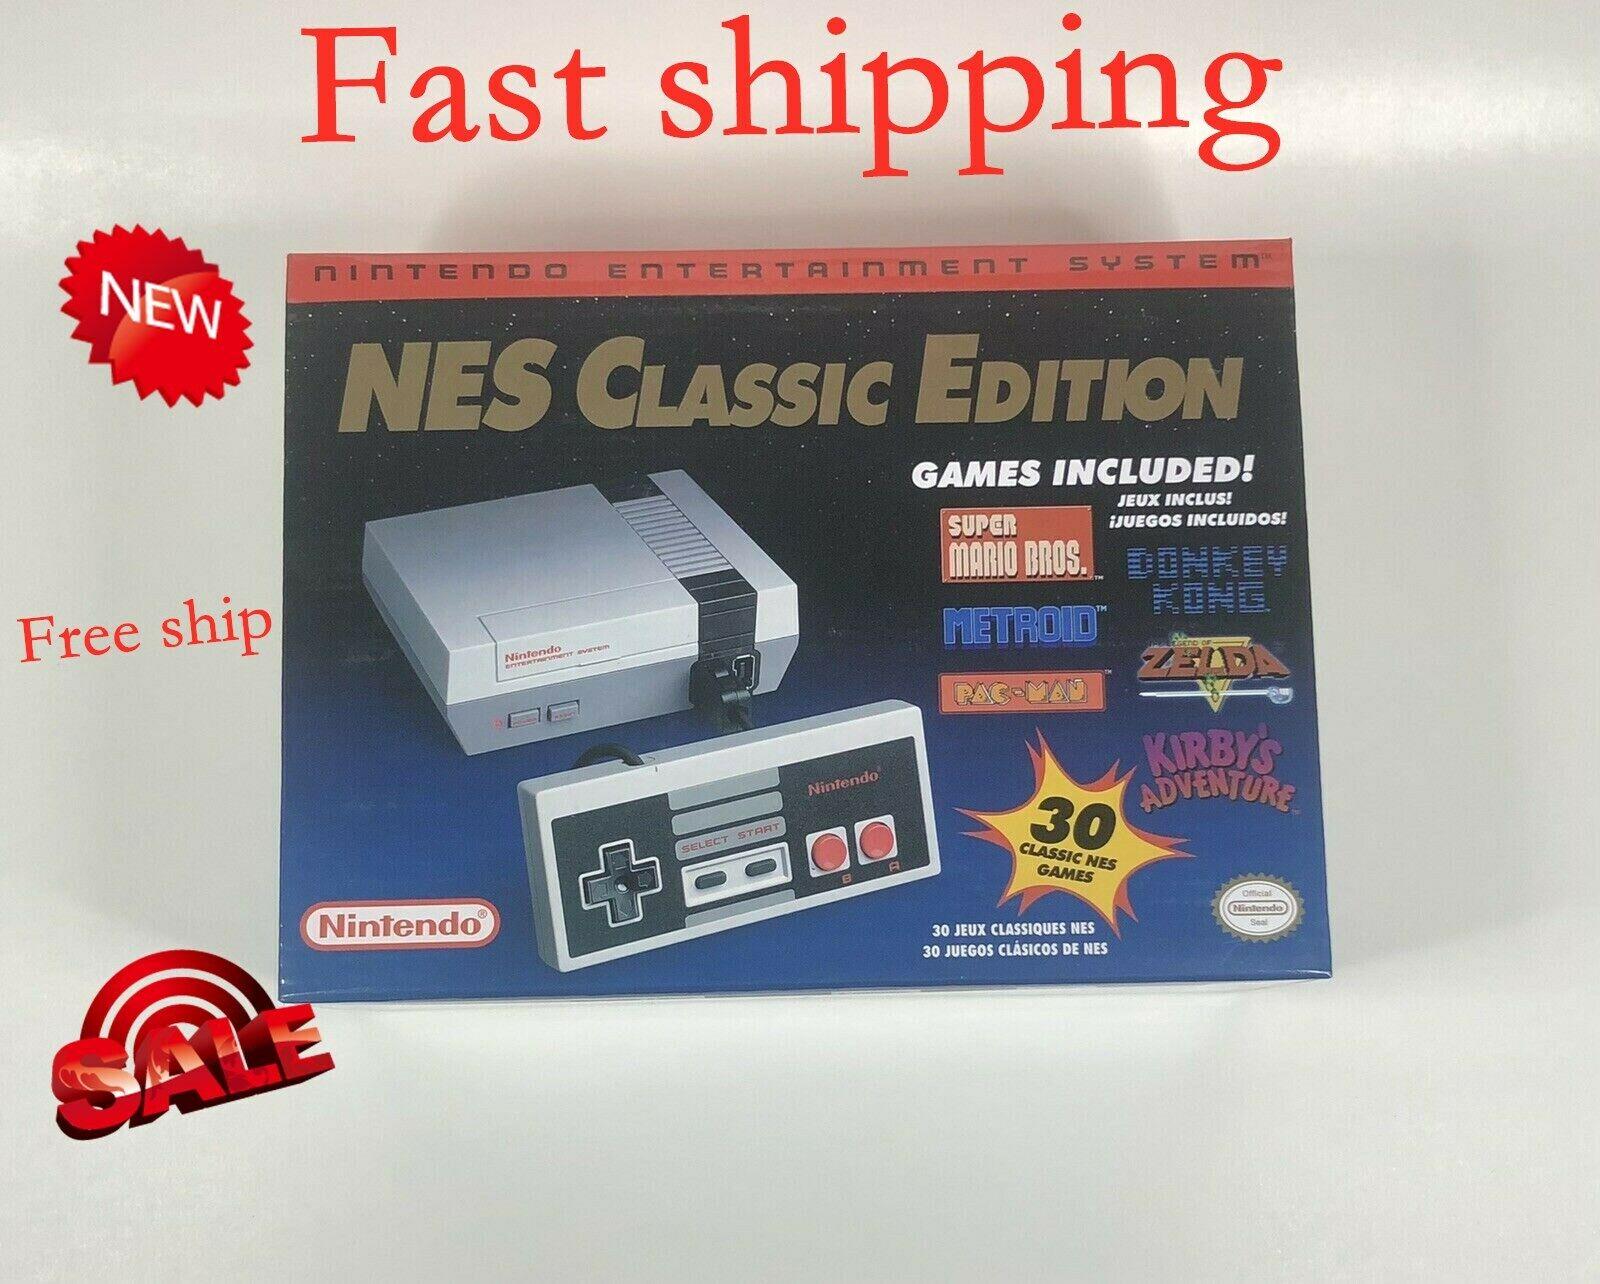 new Mini Nintendo NES Classic Edition Game Console w/30 Games + 2 Controller HD